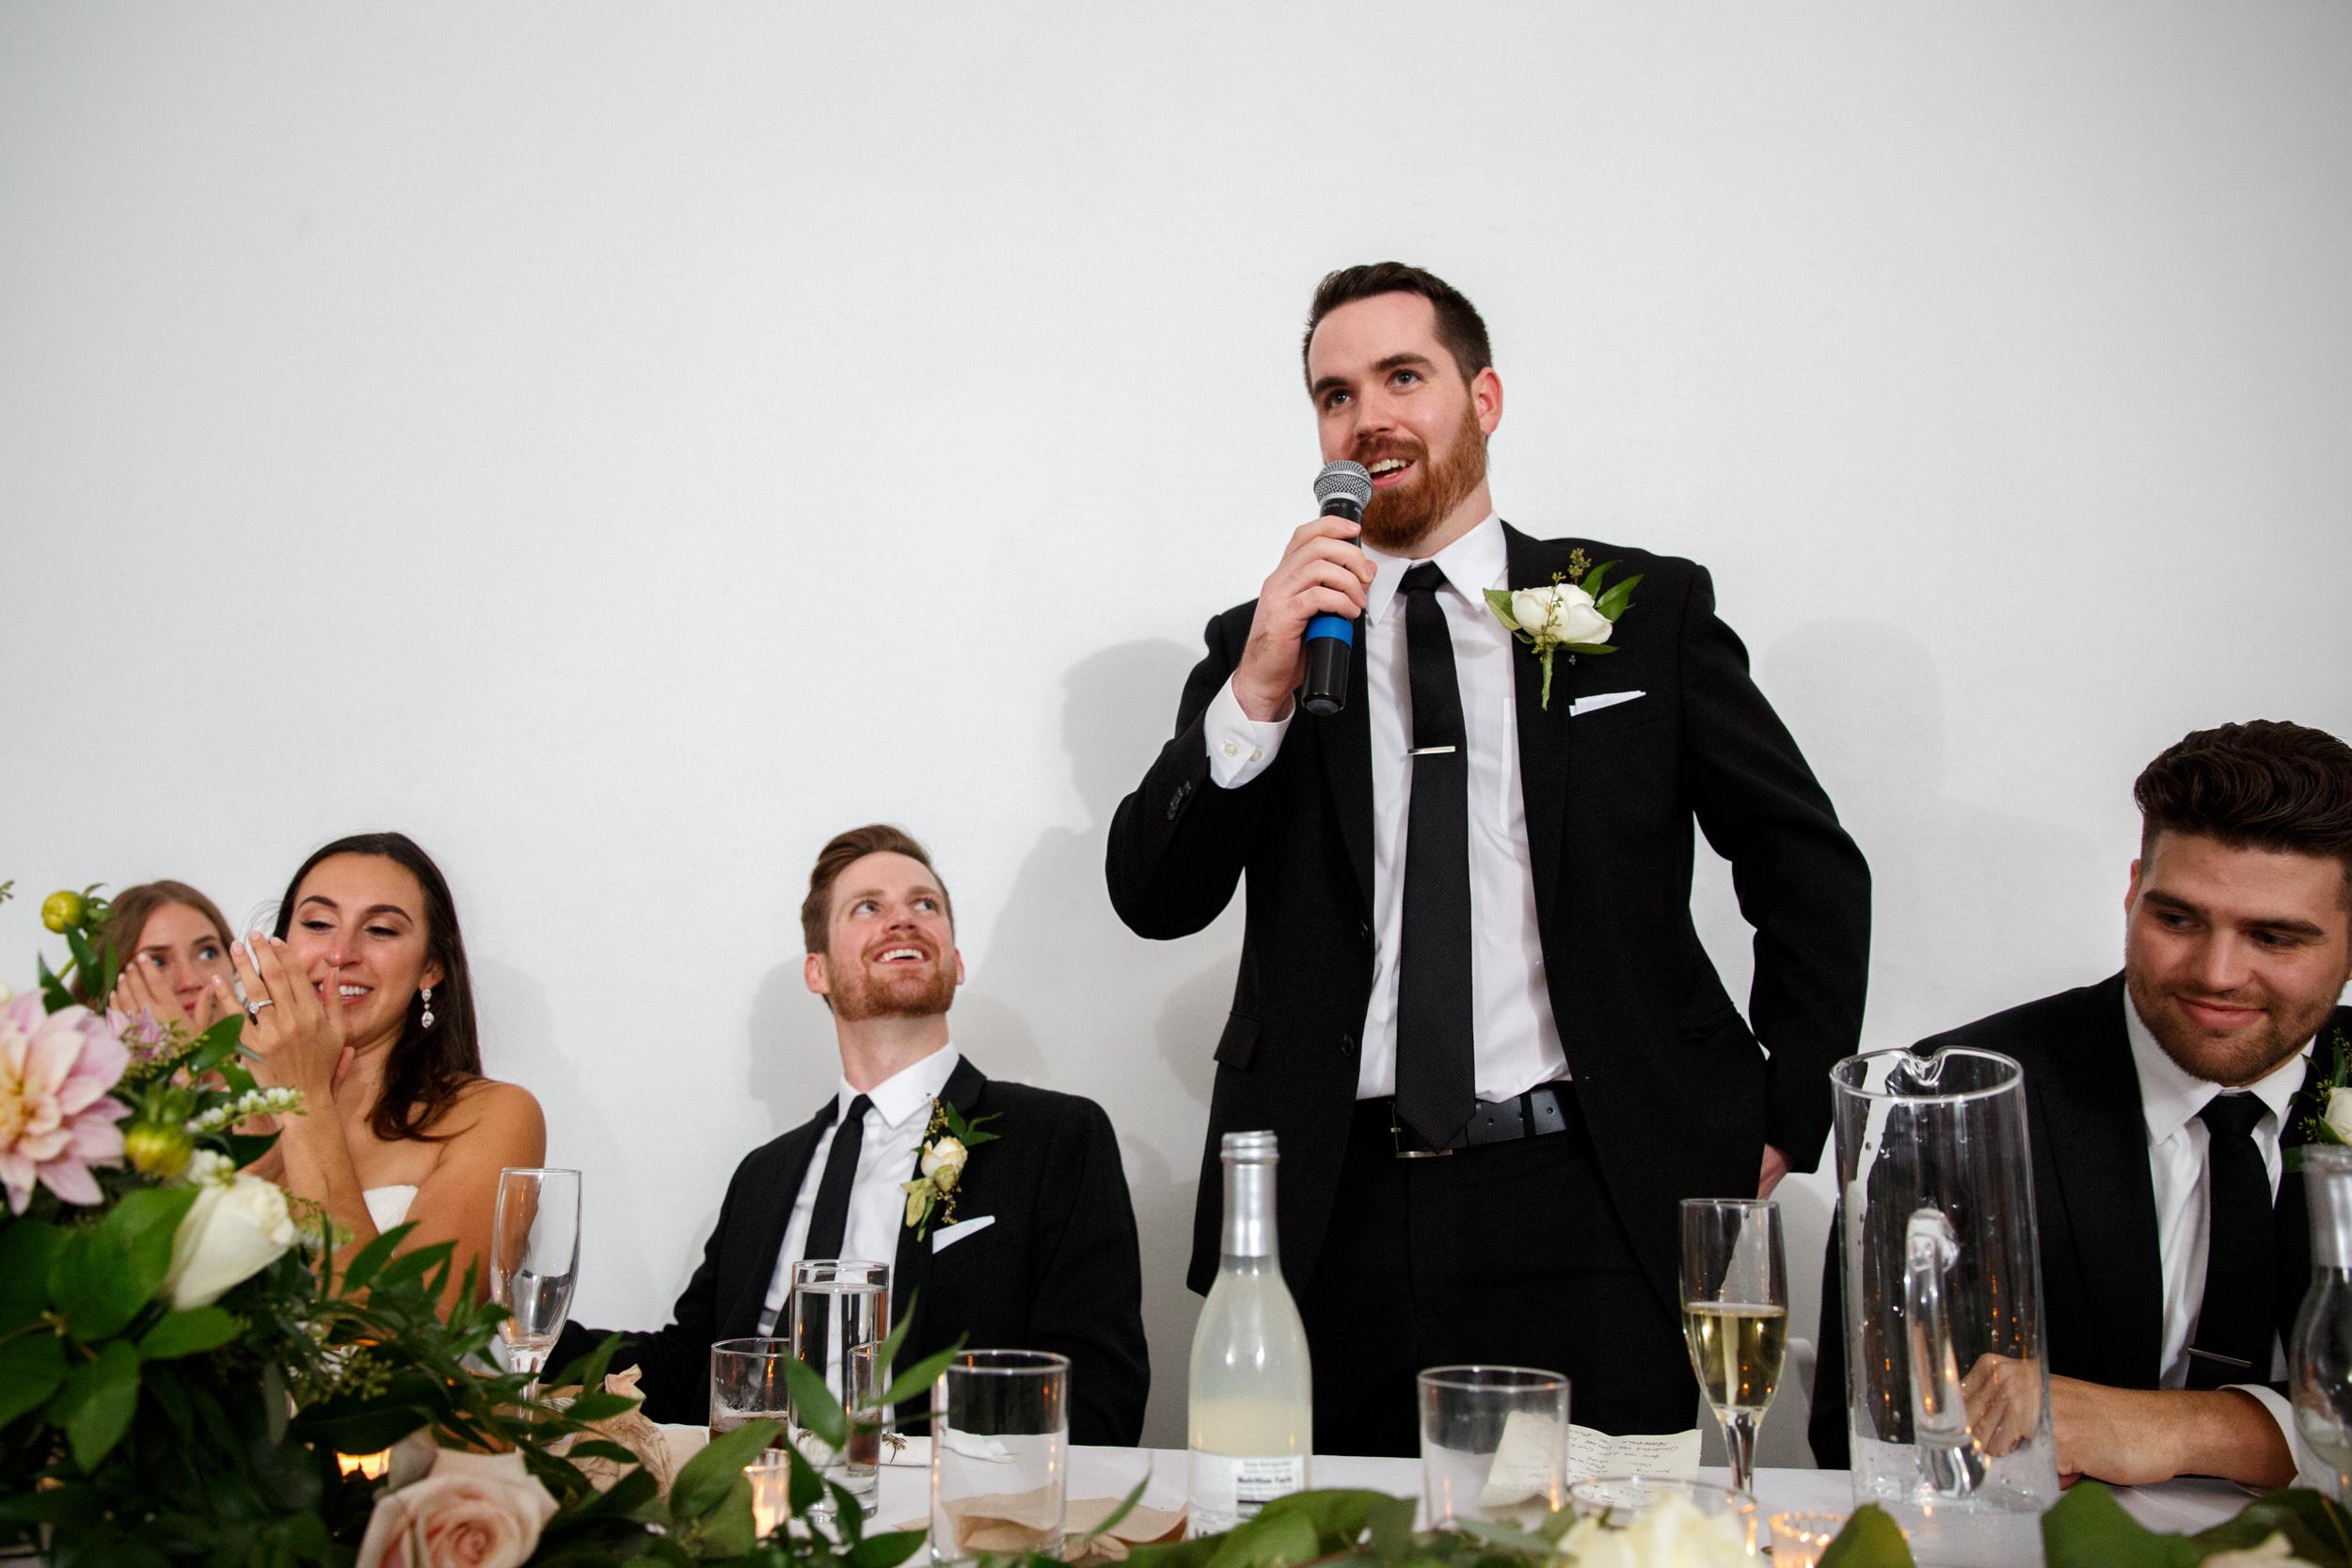 9-09-2016 Flora & Colin wedding photography by Brian Milo-182.jpg